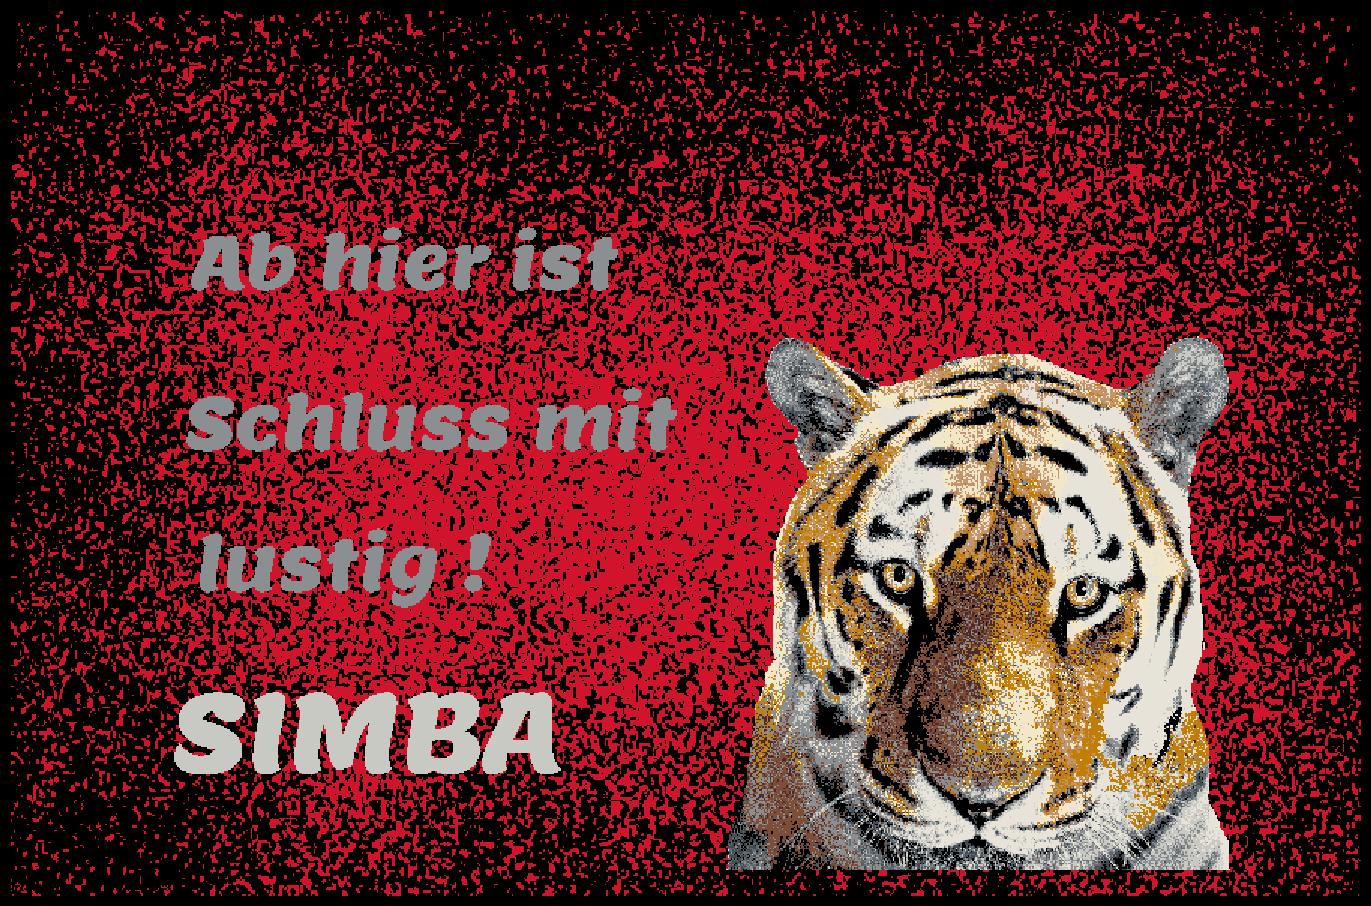 Fußmatte Schmutzfangmatte waschbar Gummirand 90x60 90x60 90x60 cm Wunschname Tiger 43fb26